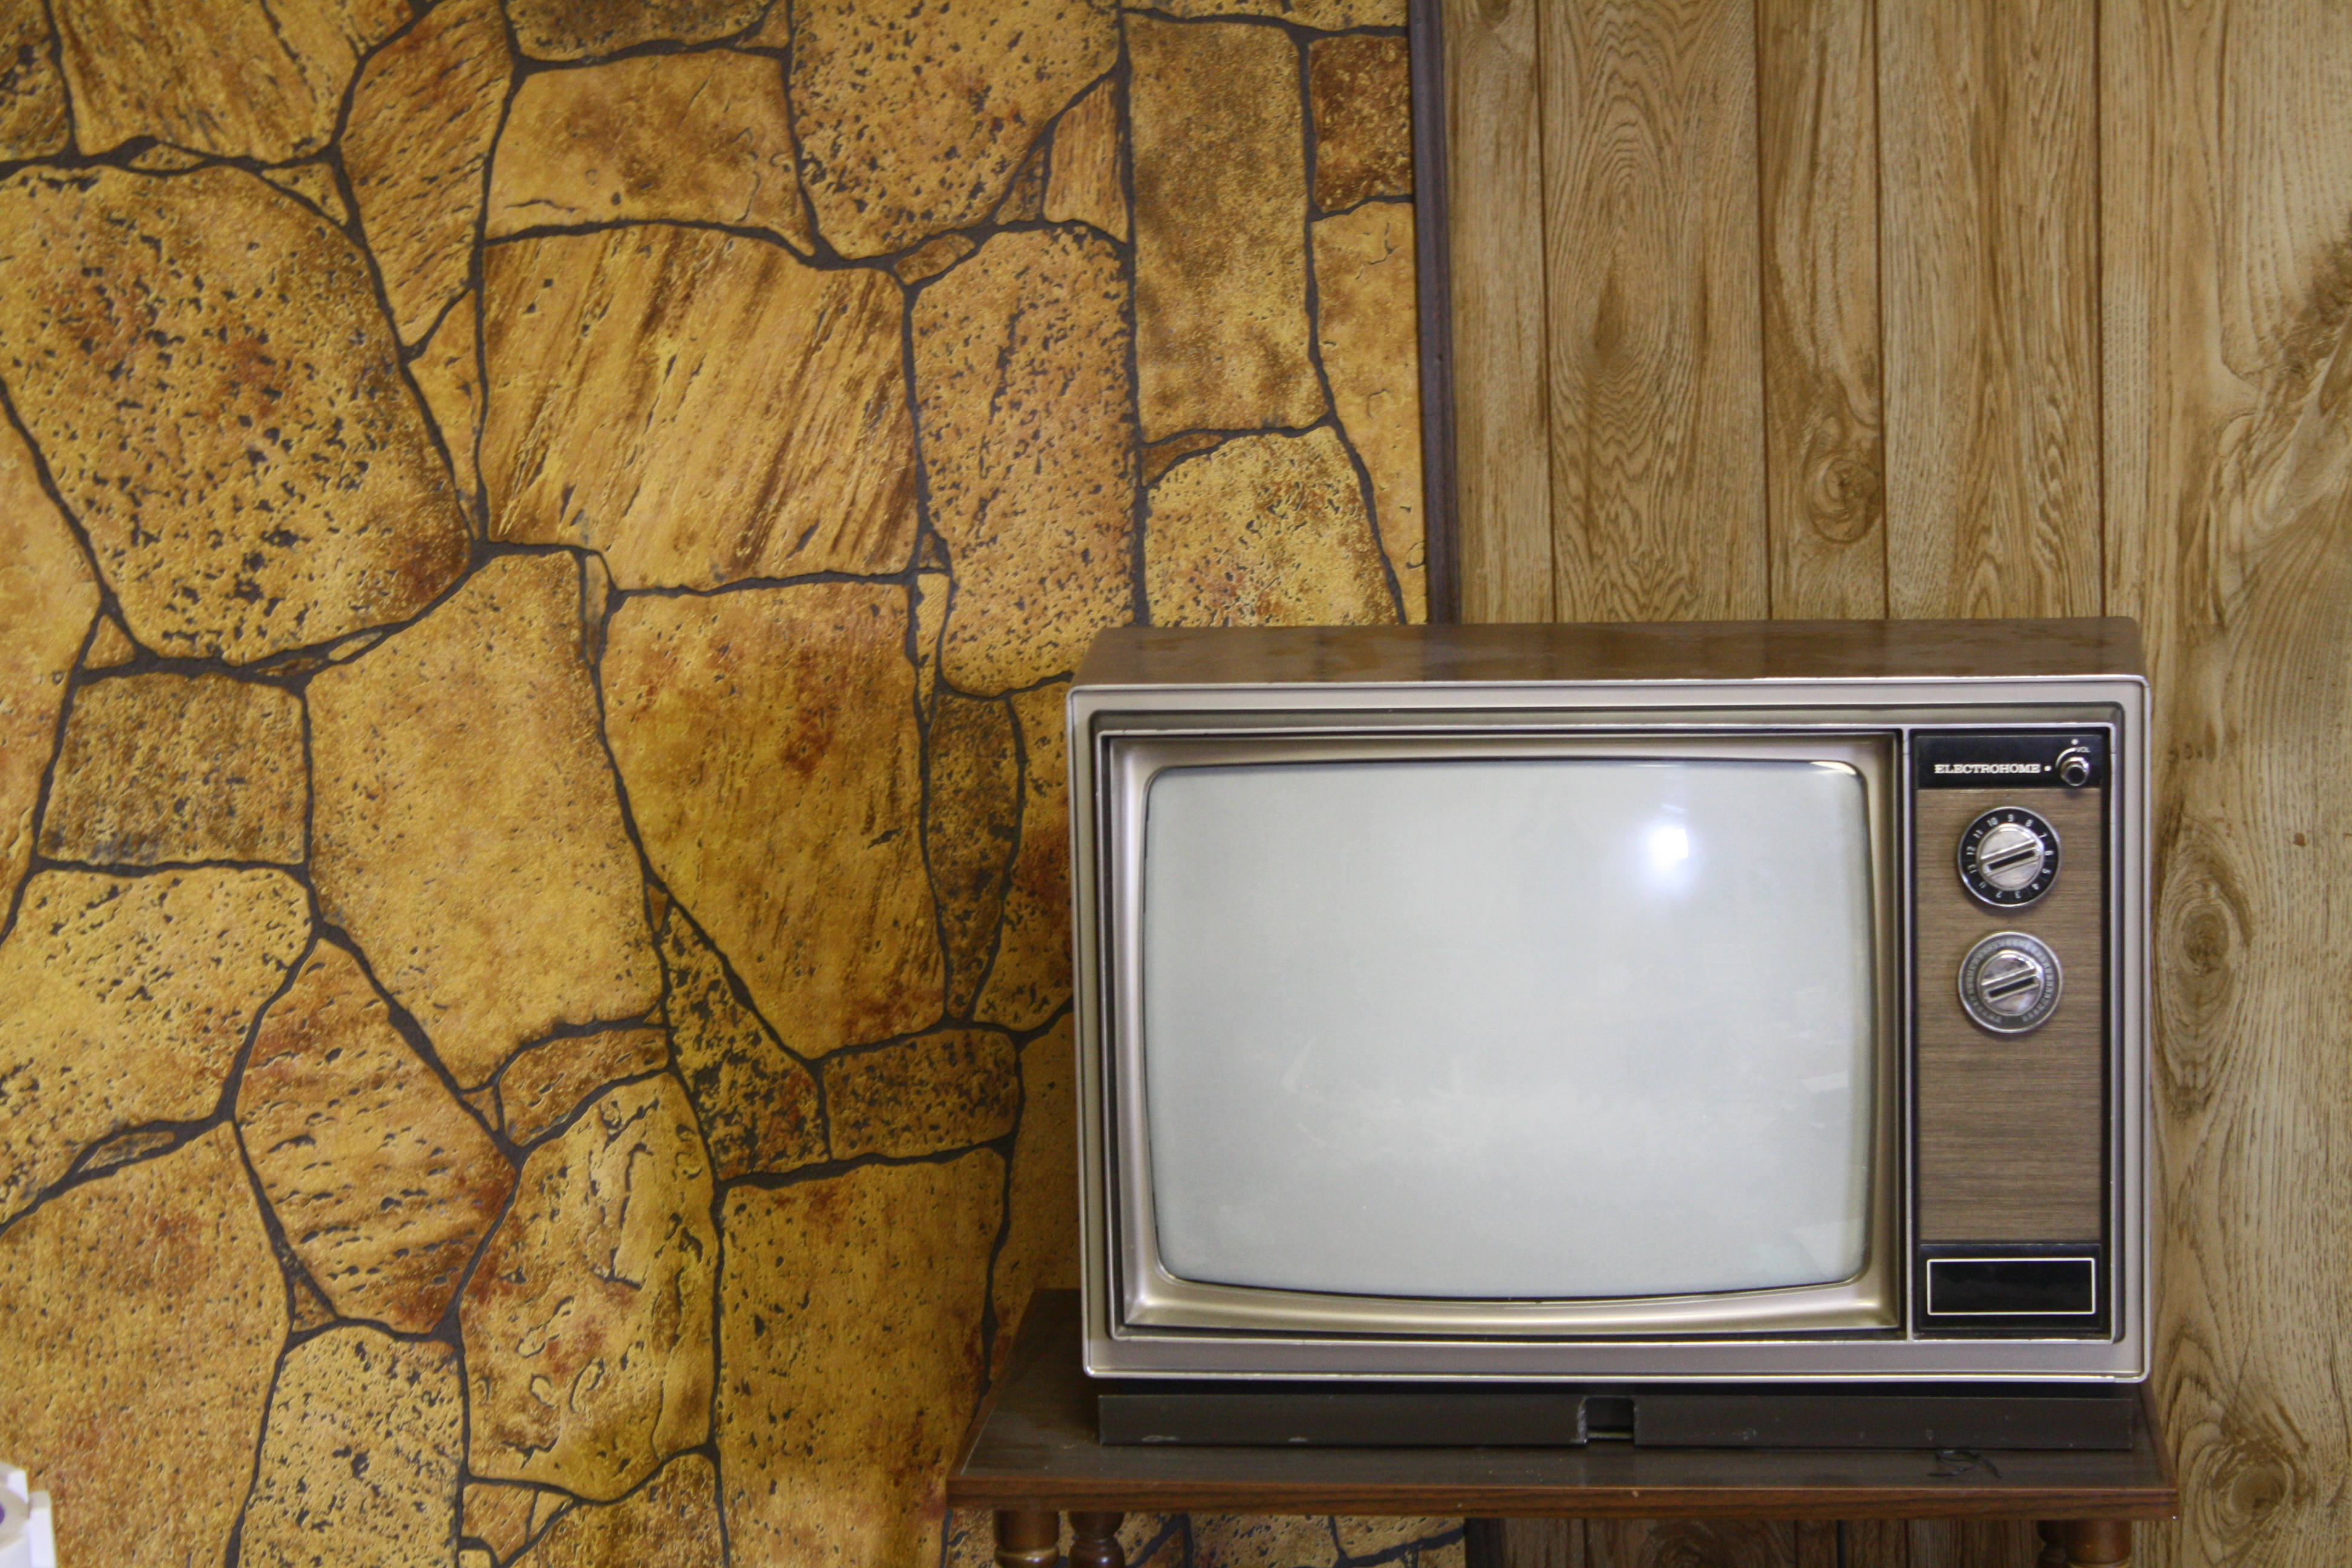 http://fc04.deviantart.net/fs42/f/2009/062/5/b/Pulling_Stock___Television_by_Pulling_Stock.jpg